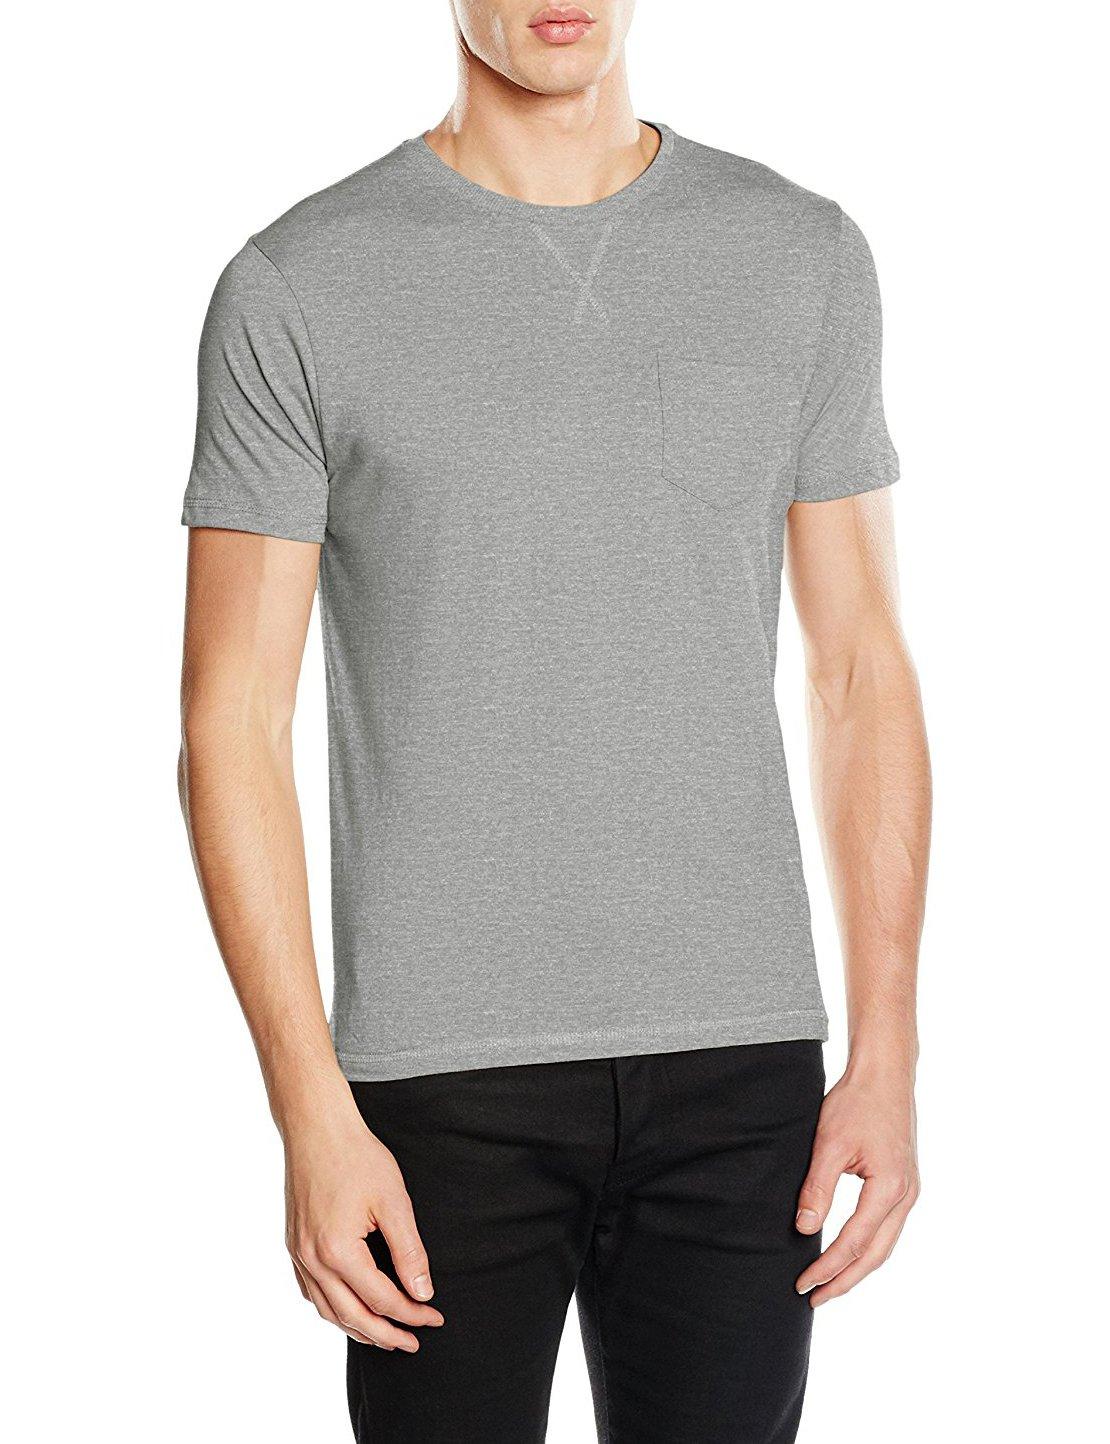 Mens Brave Soul Shirt Formal Short Sleeve Seam Dart Detailed Collared Casual Top